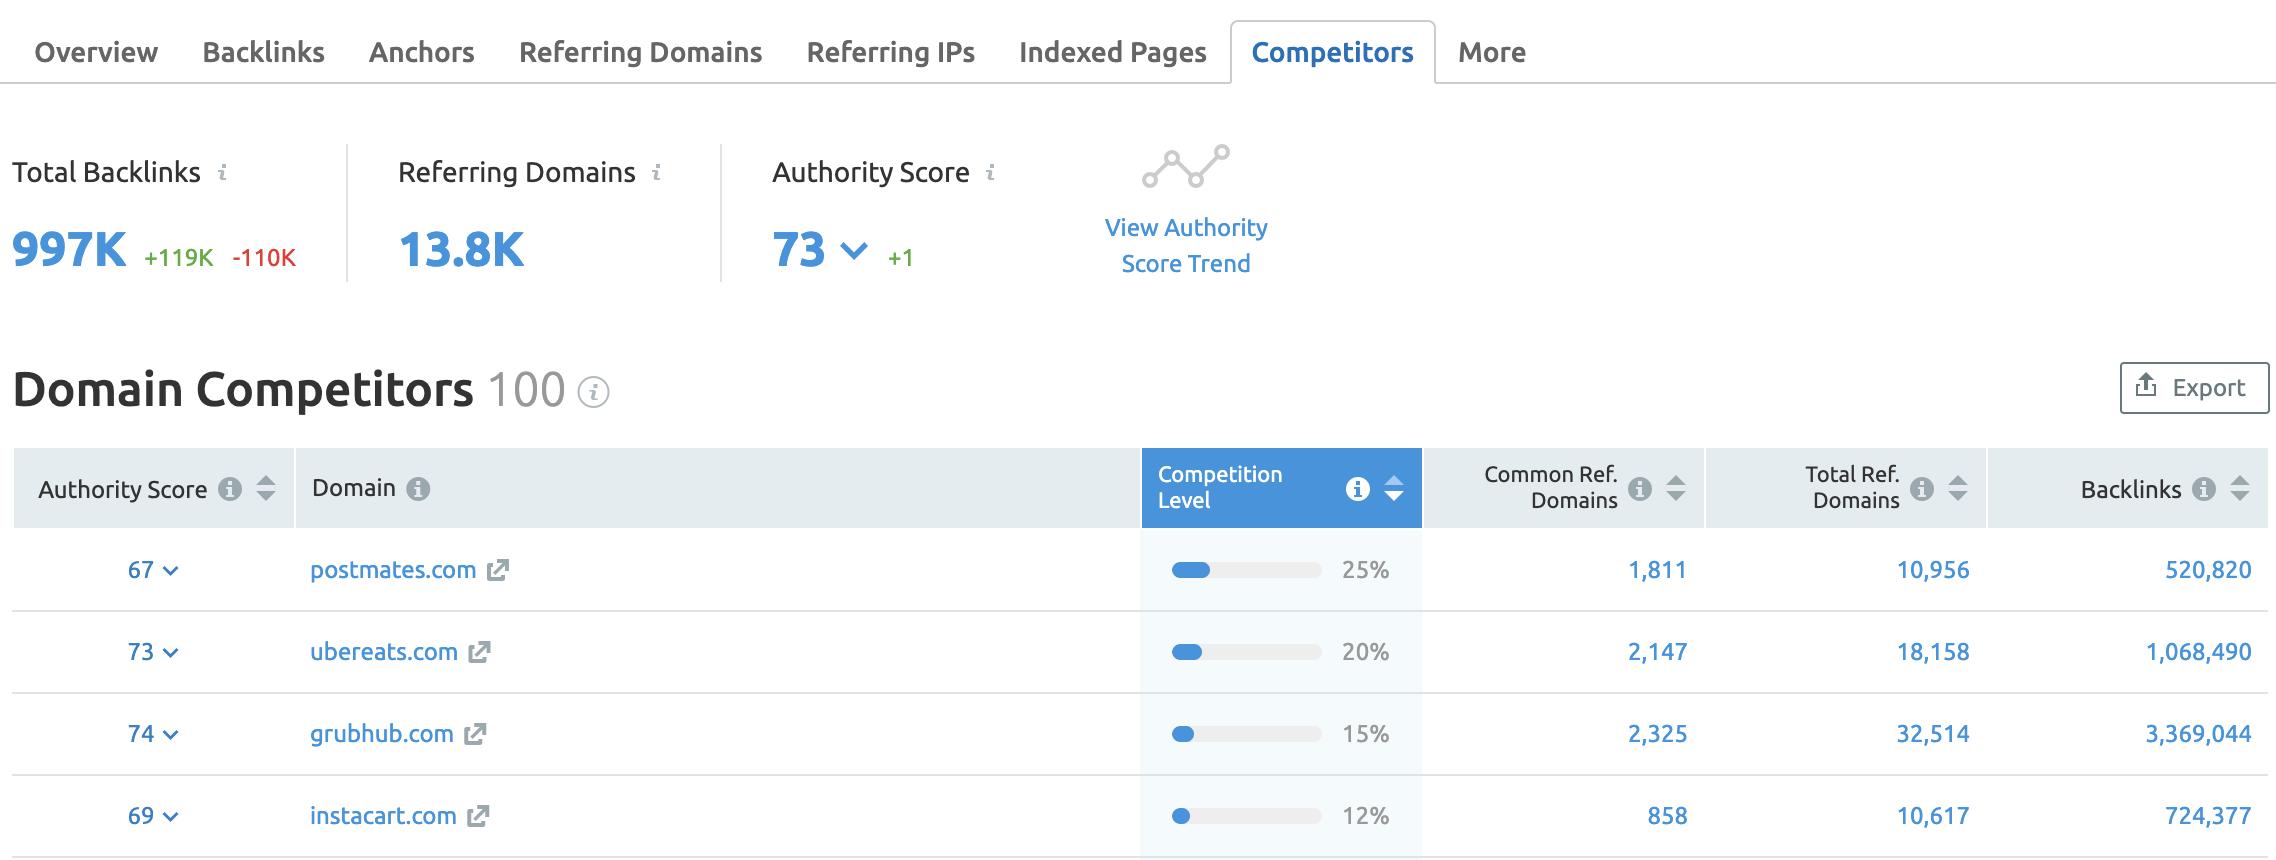 Domain Competitors report